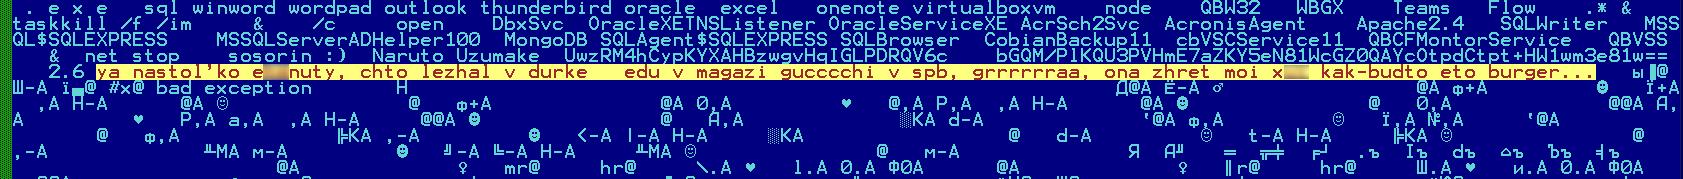 JSworm malware 13